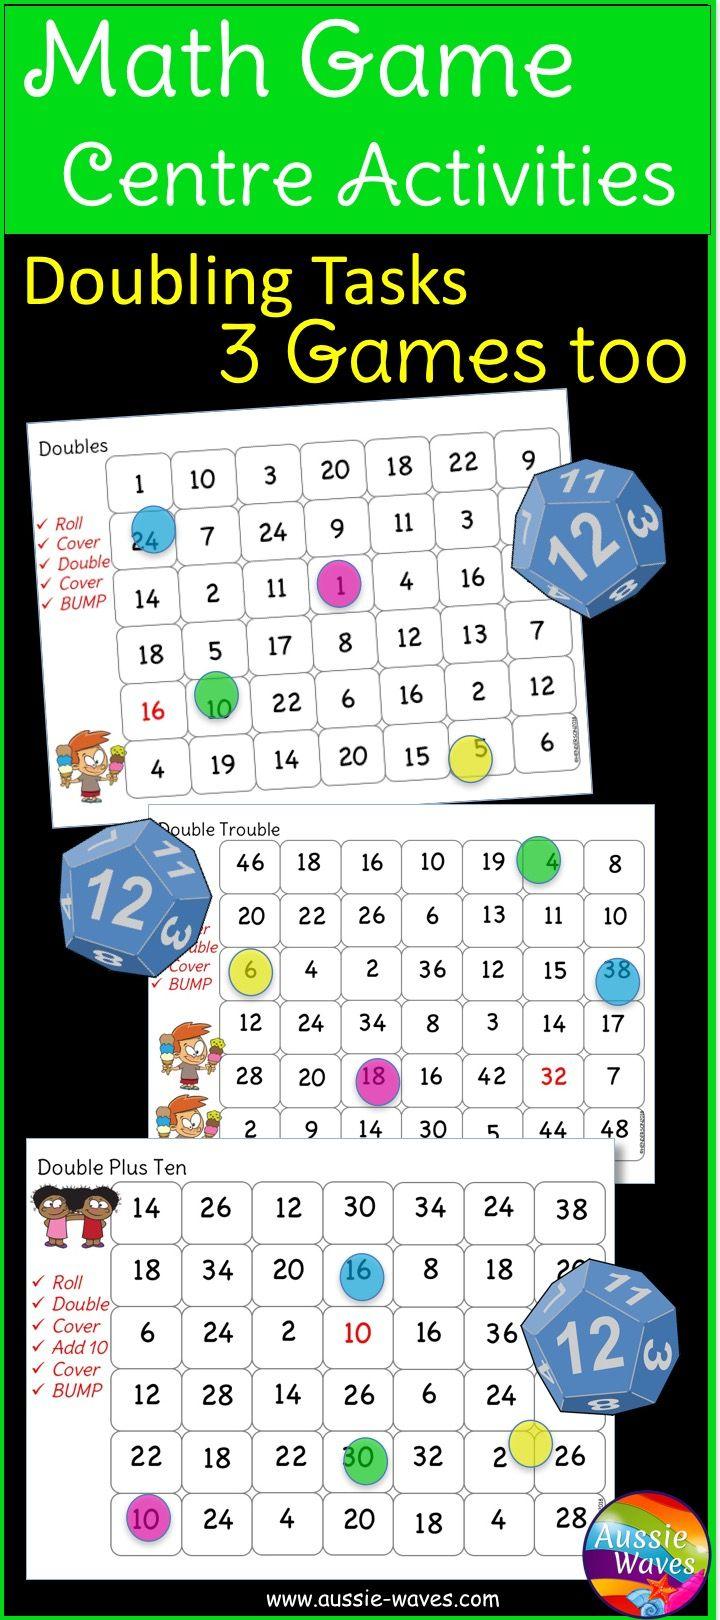 Best 15 Addition Worksheets You Calendars Https Www Youcalendars Com Addition Worksheets Html Math Addition Games Printable Math Games Math Games